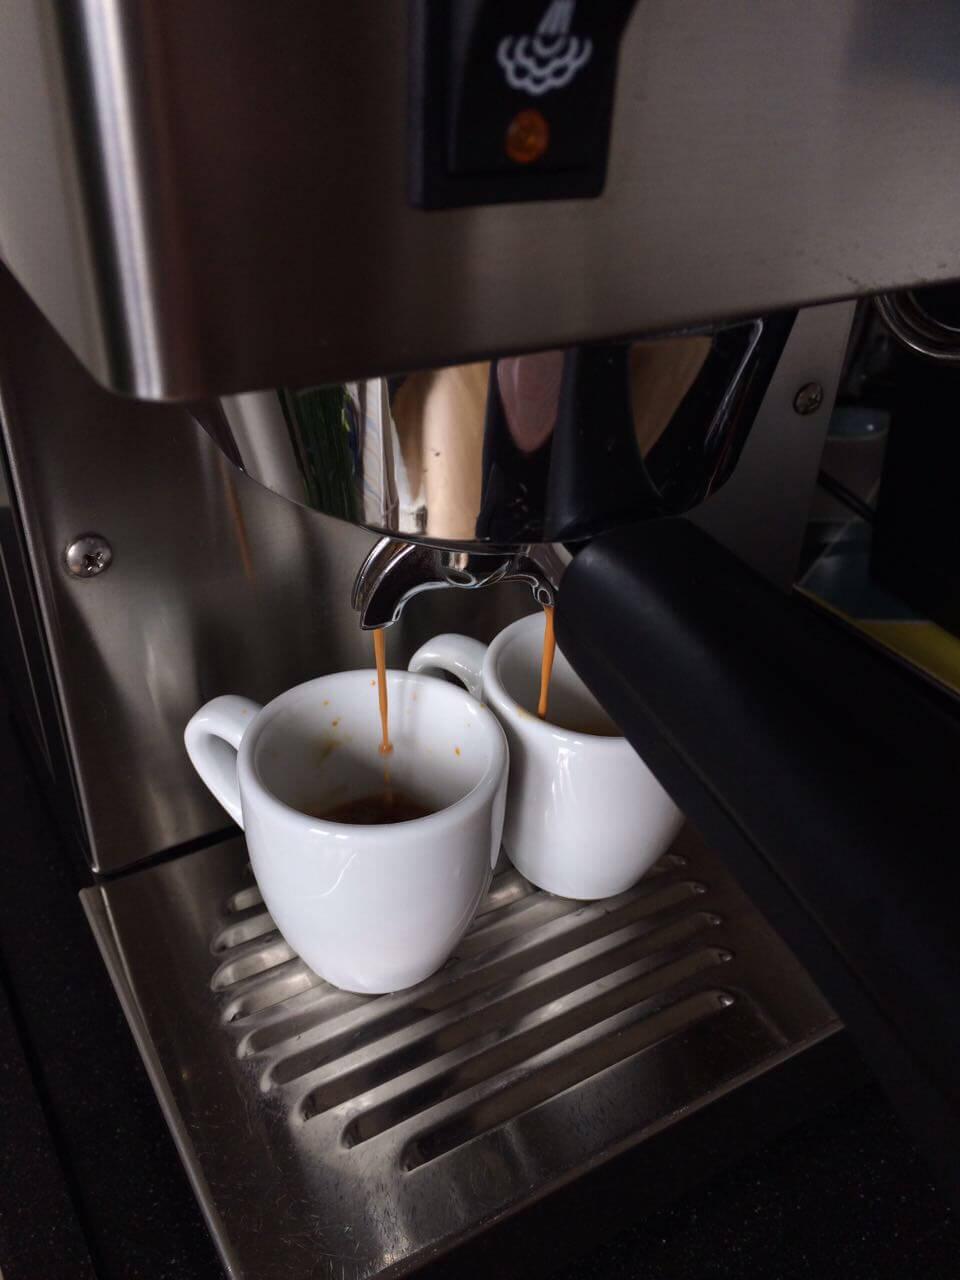 Espressobezug Rancilio Silvia